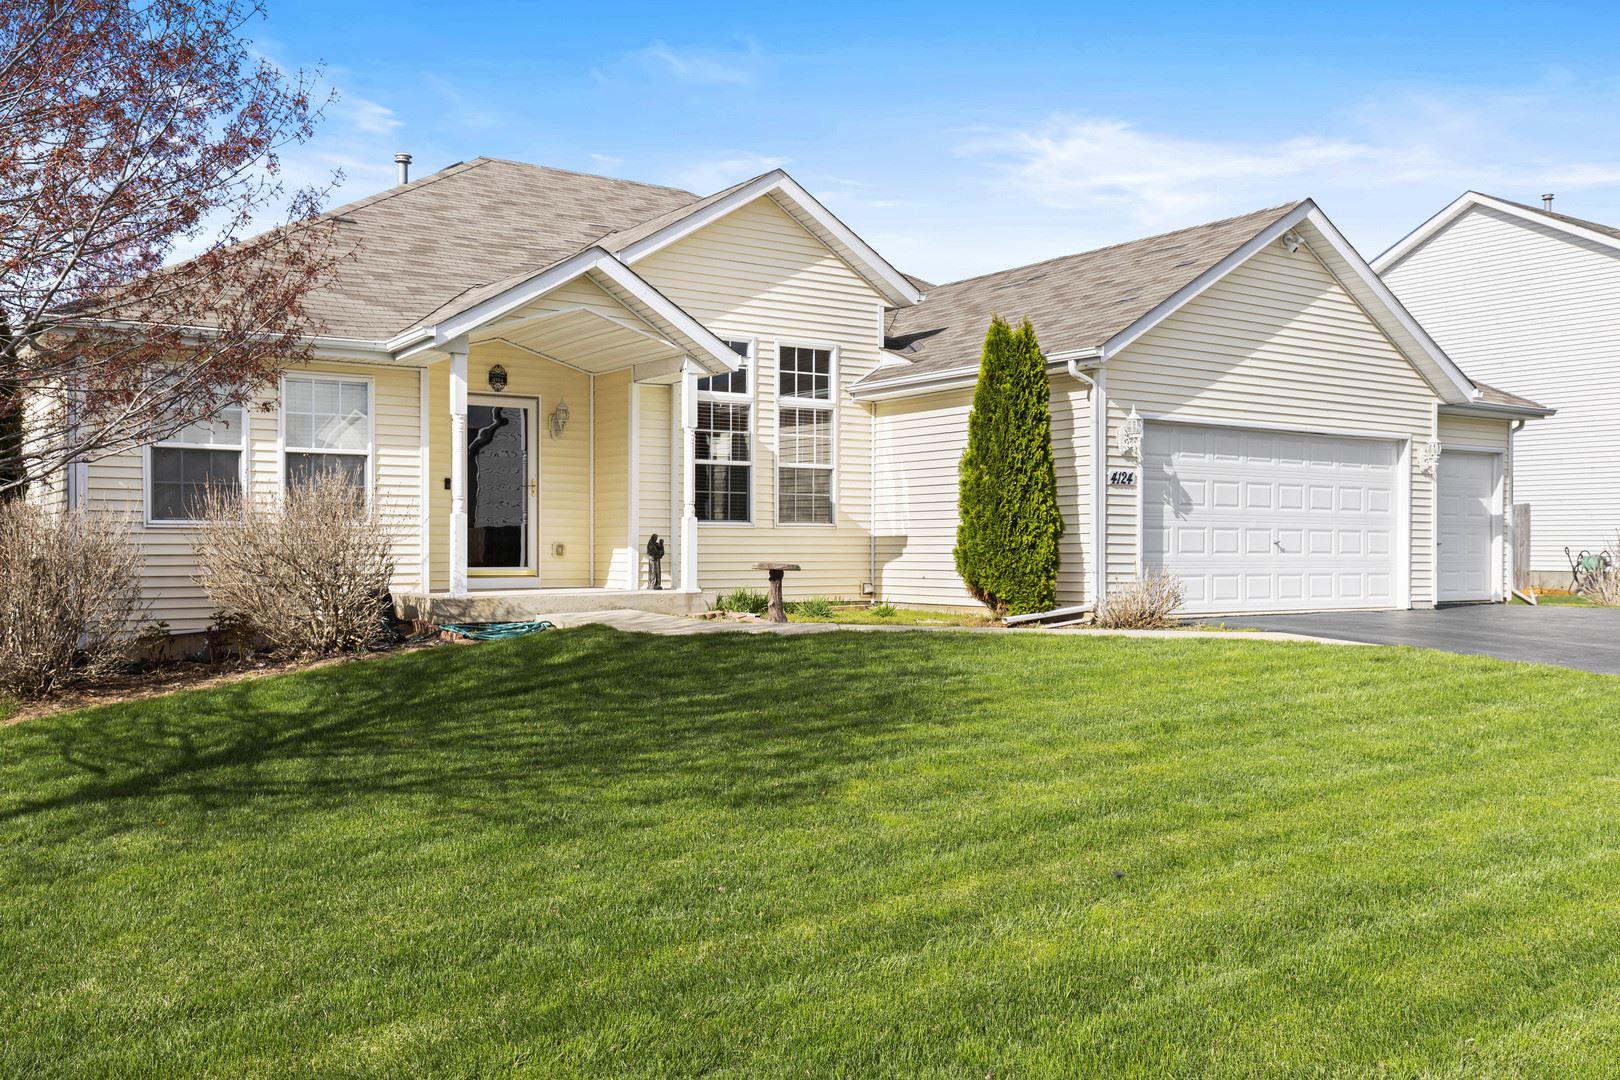 4124 Milkweed Drive, Poplar Grove, IL 61065 - #: 11059794